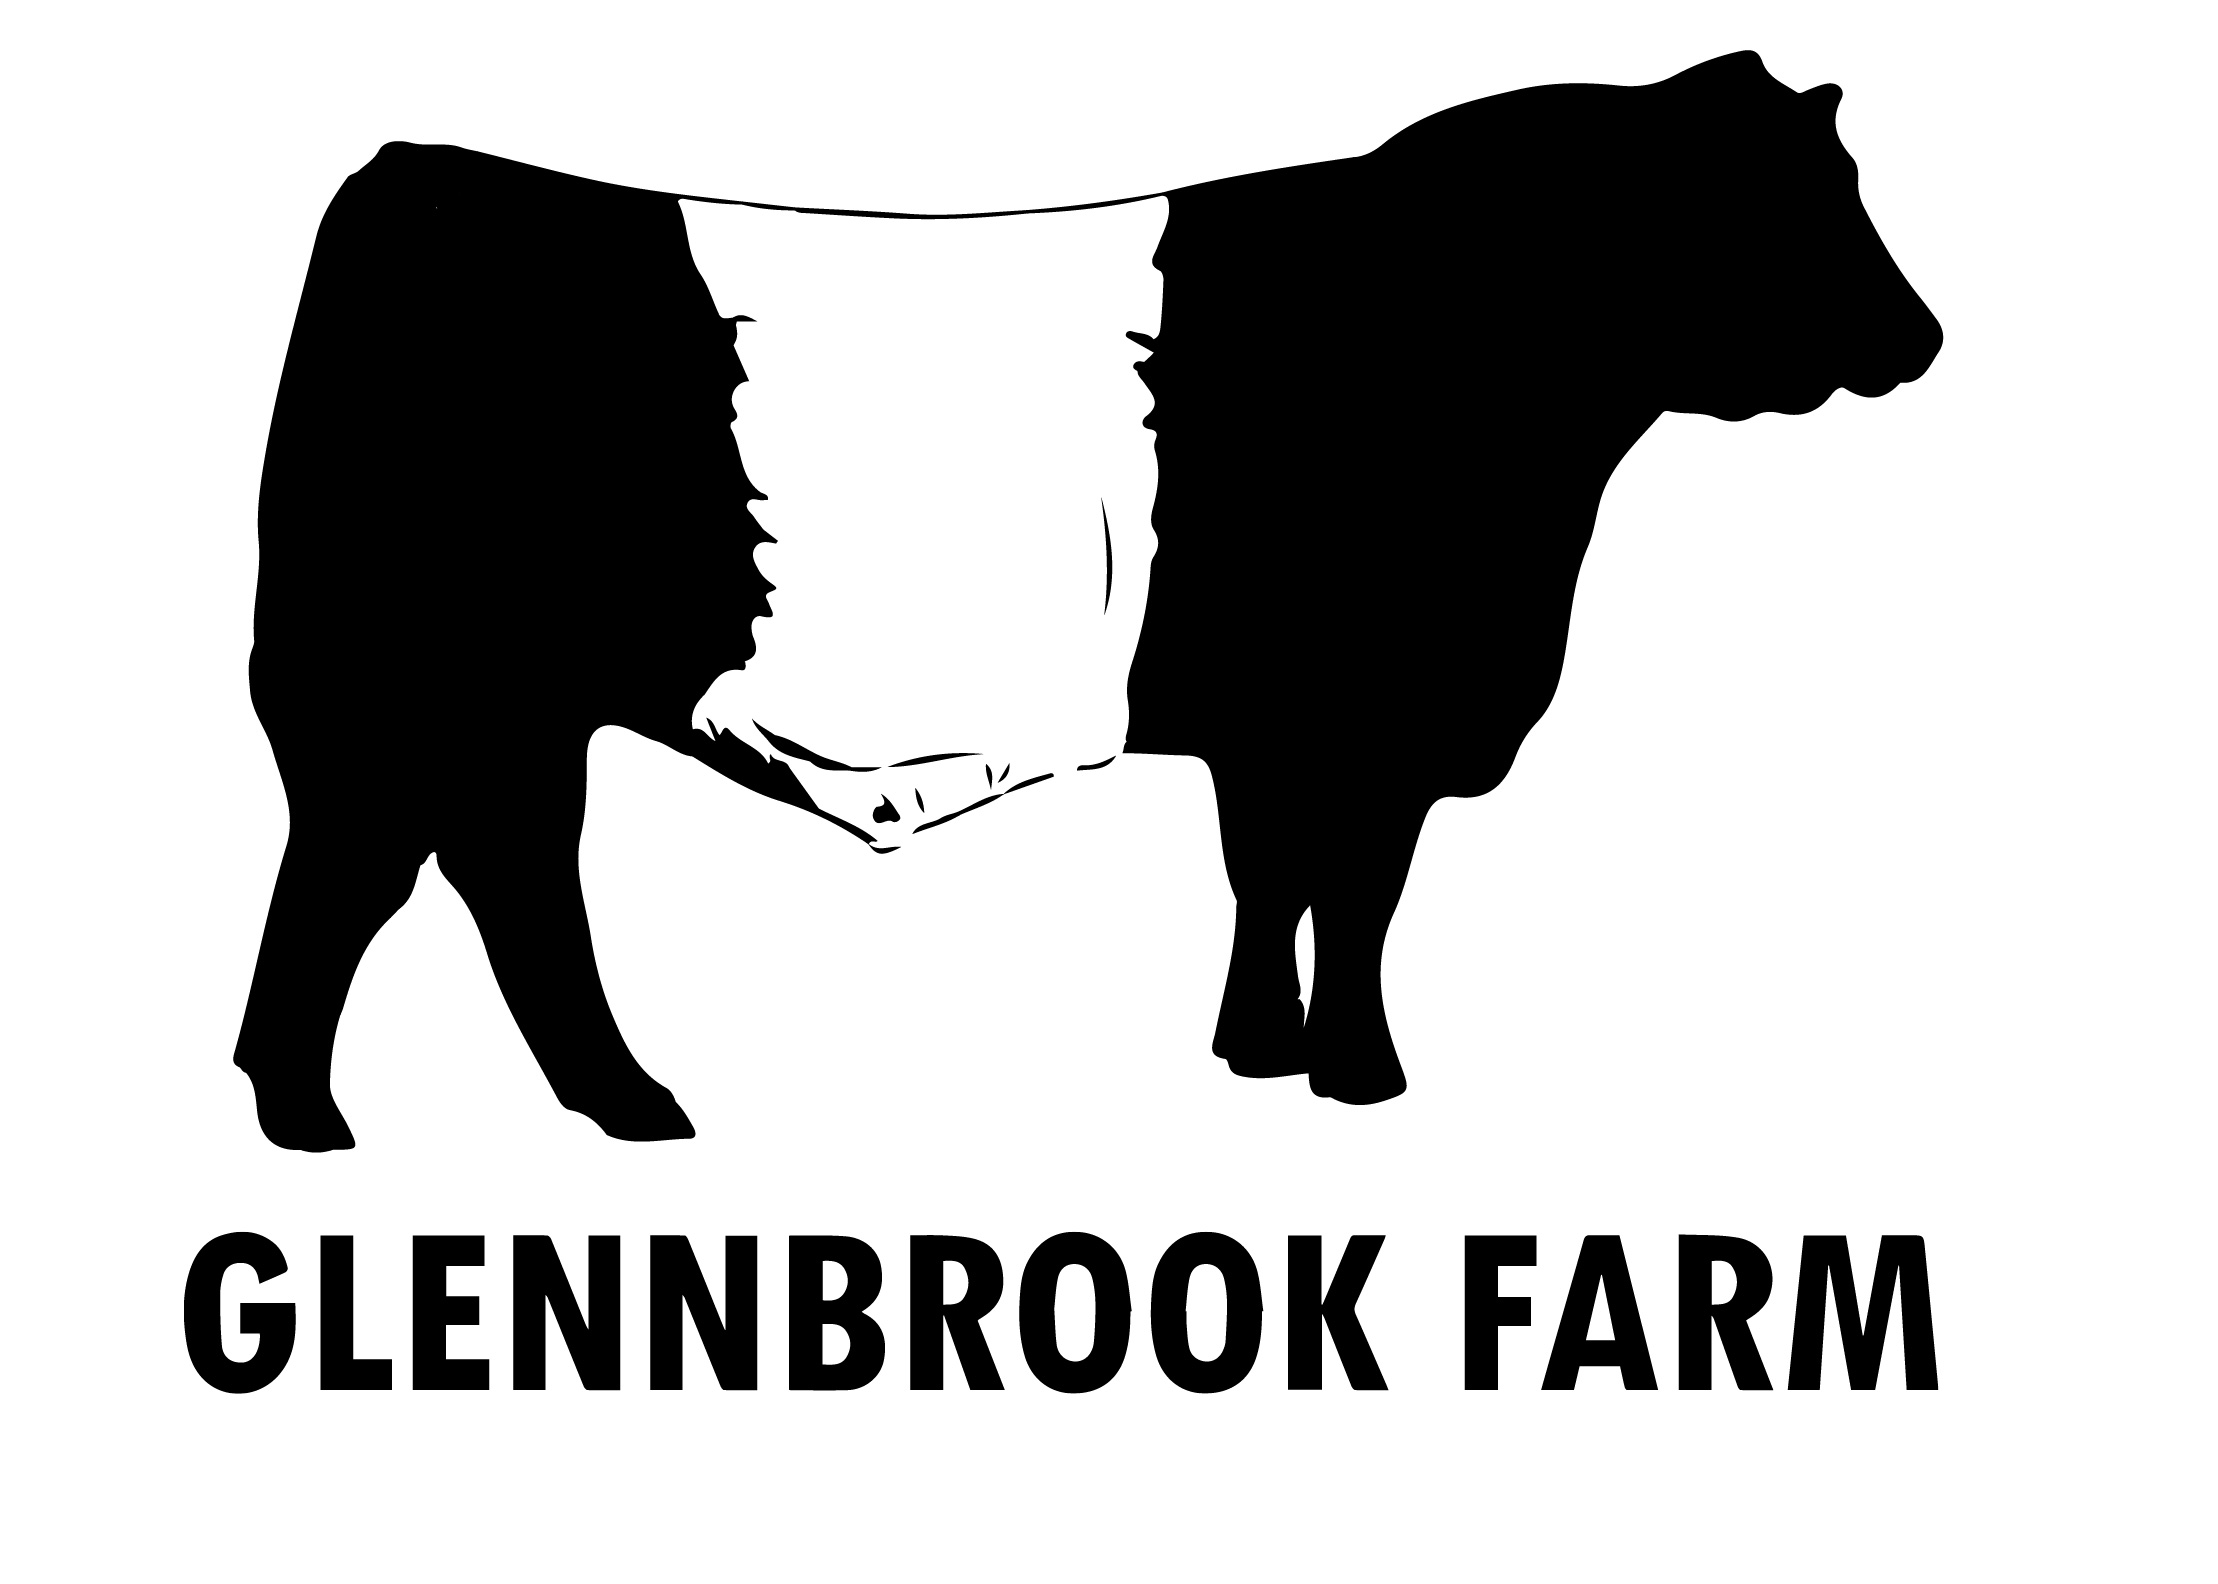 Glenbrook Farm_2021 B&W Logo_Vector-01